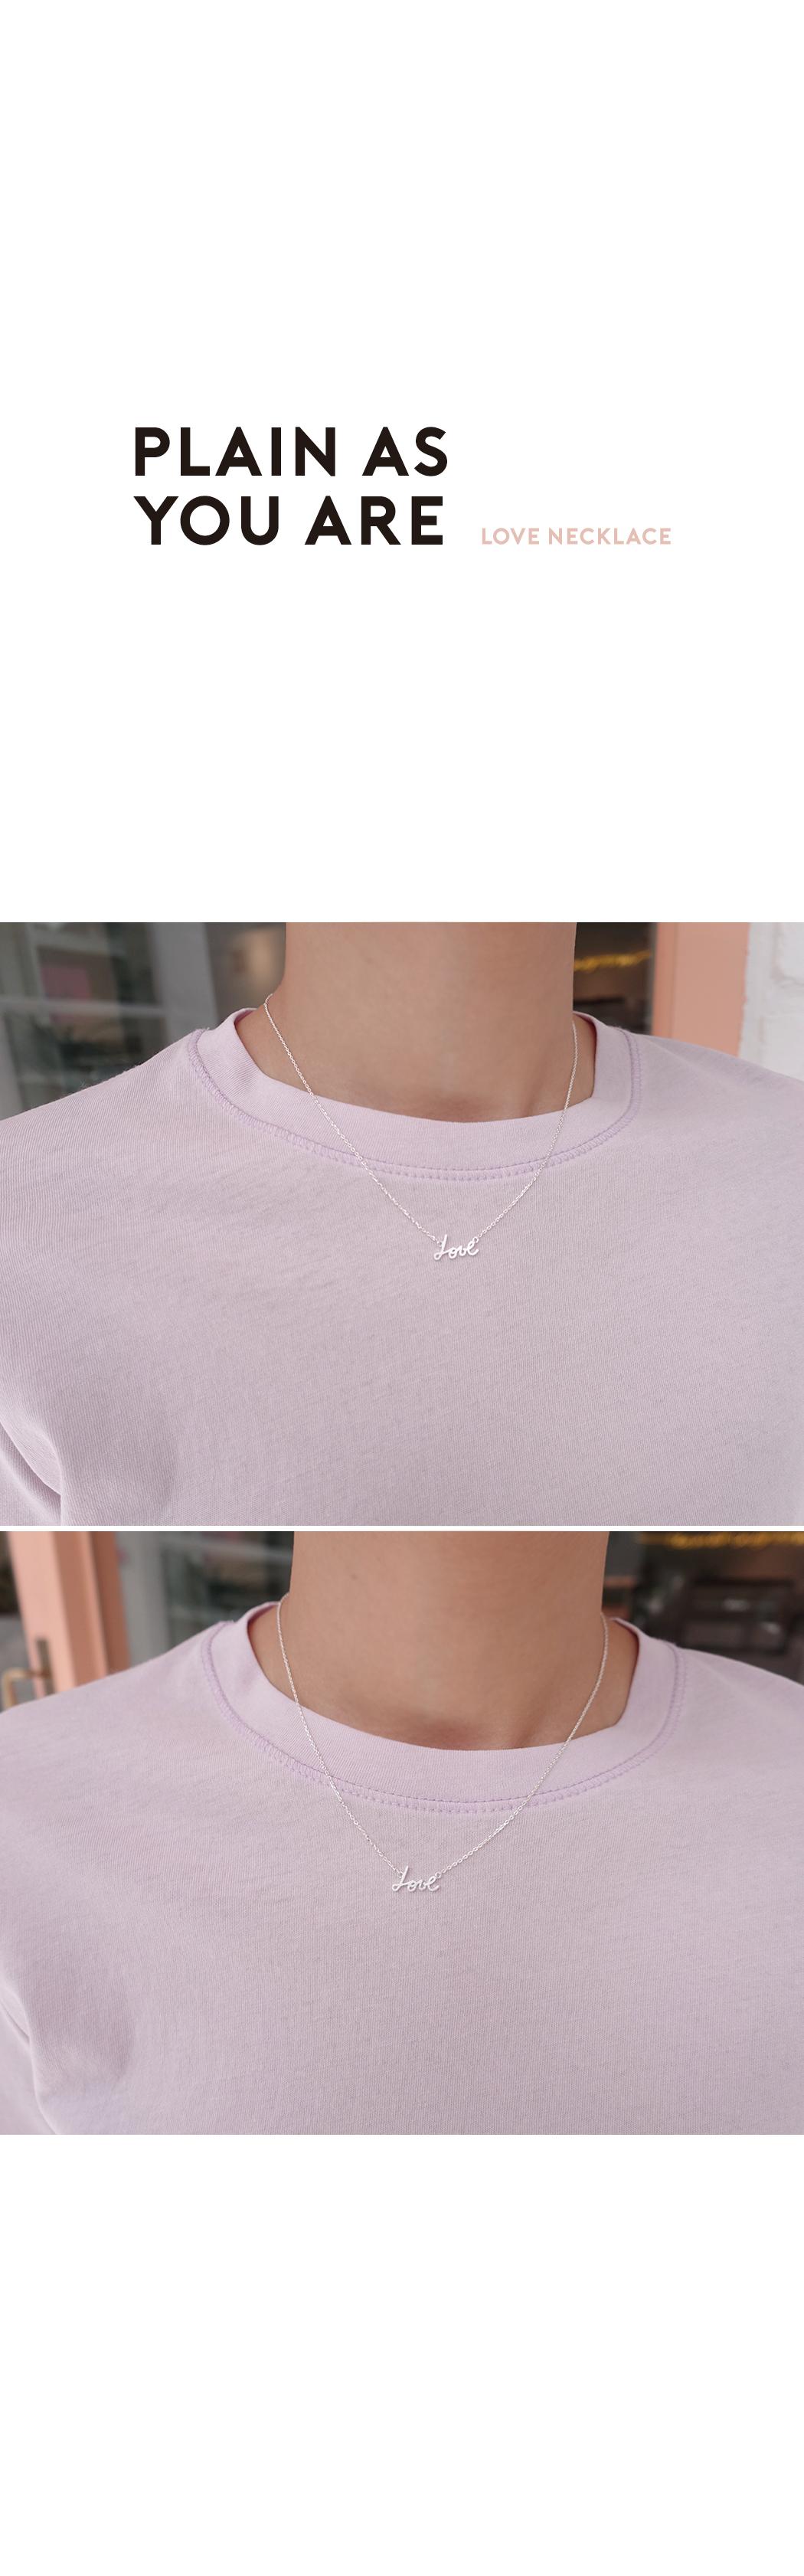 Zem No.129 (necklace)